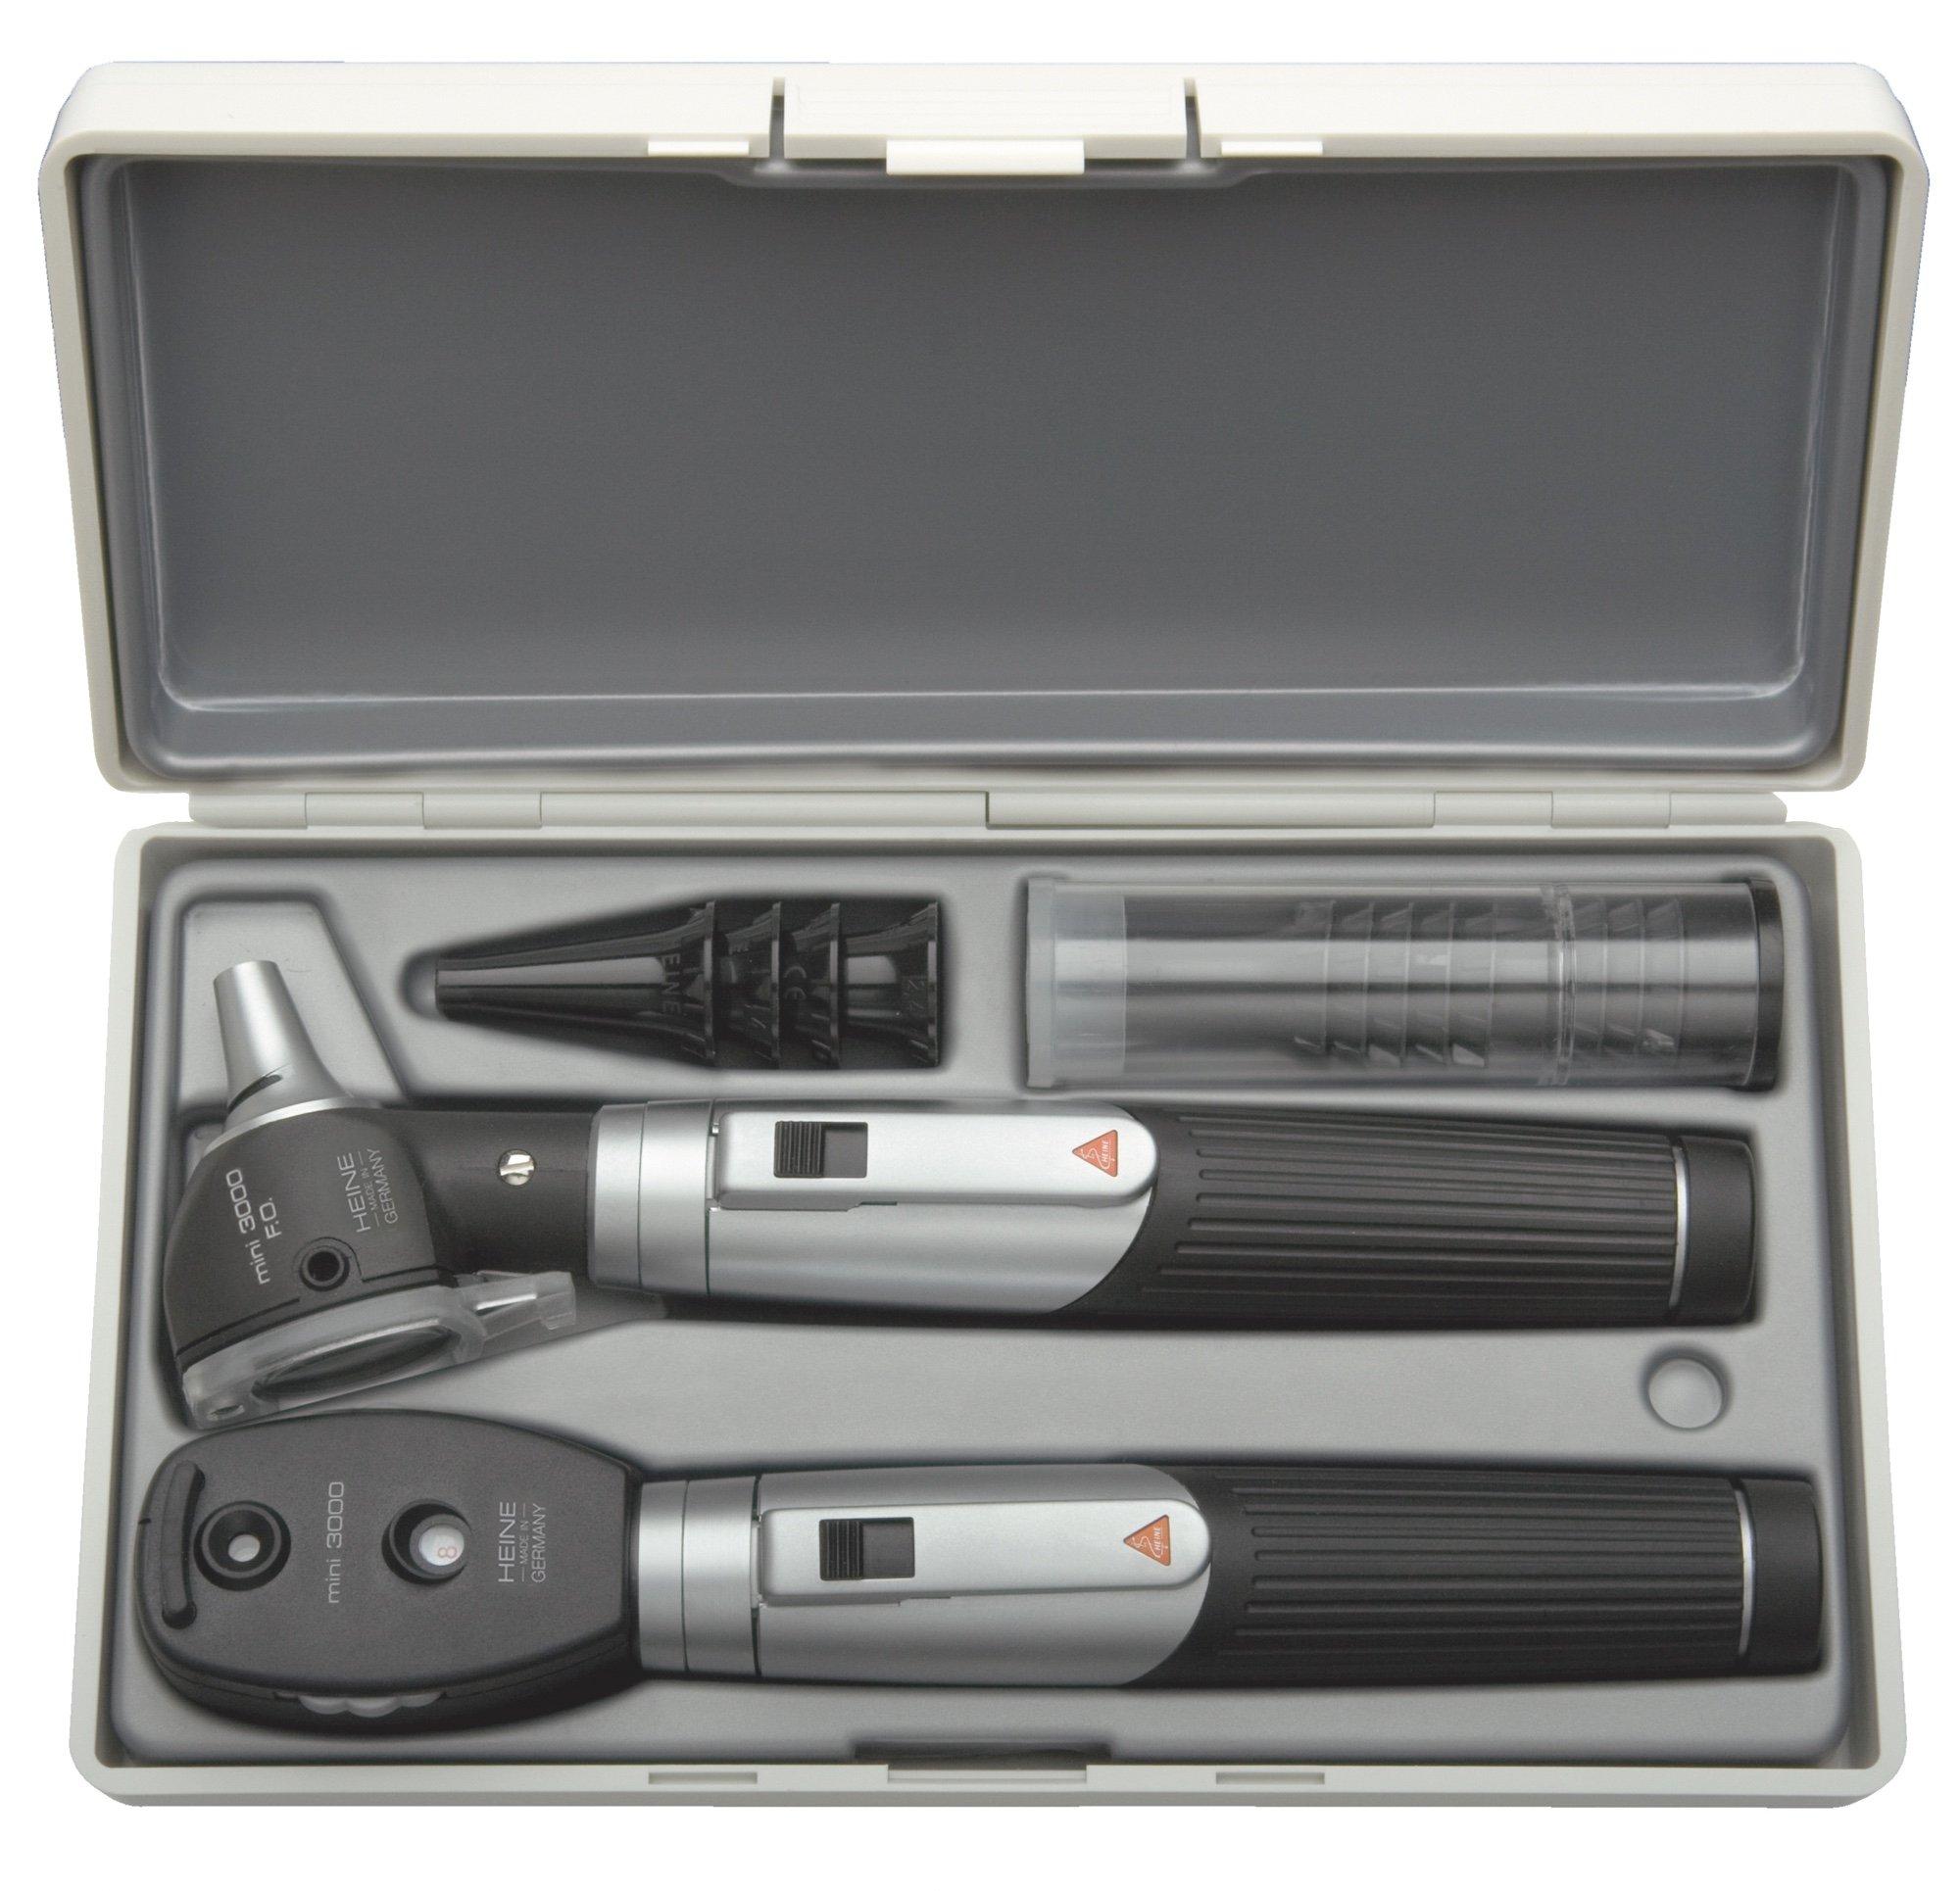 HEINE mini3000 F.O Otoscope/Ophthalmoscope Combined Set